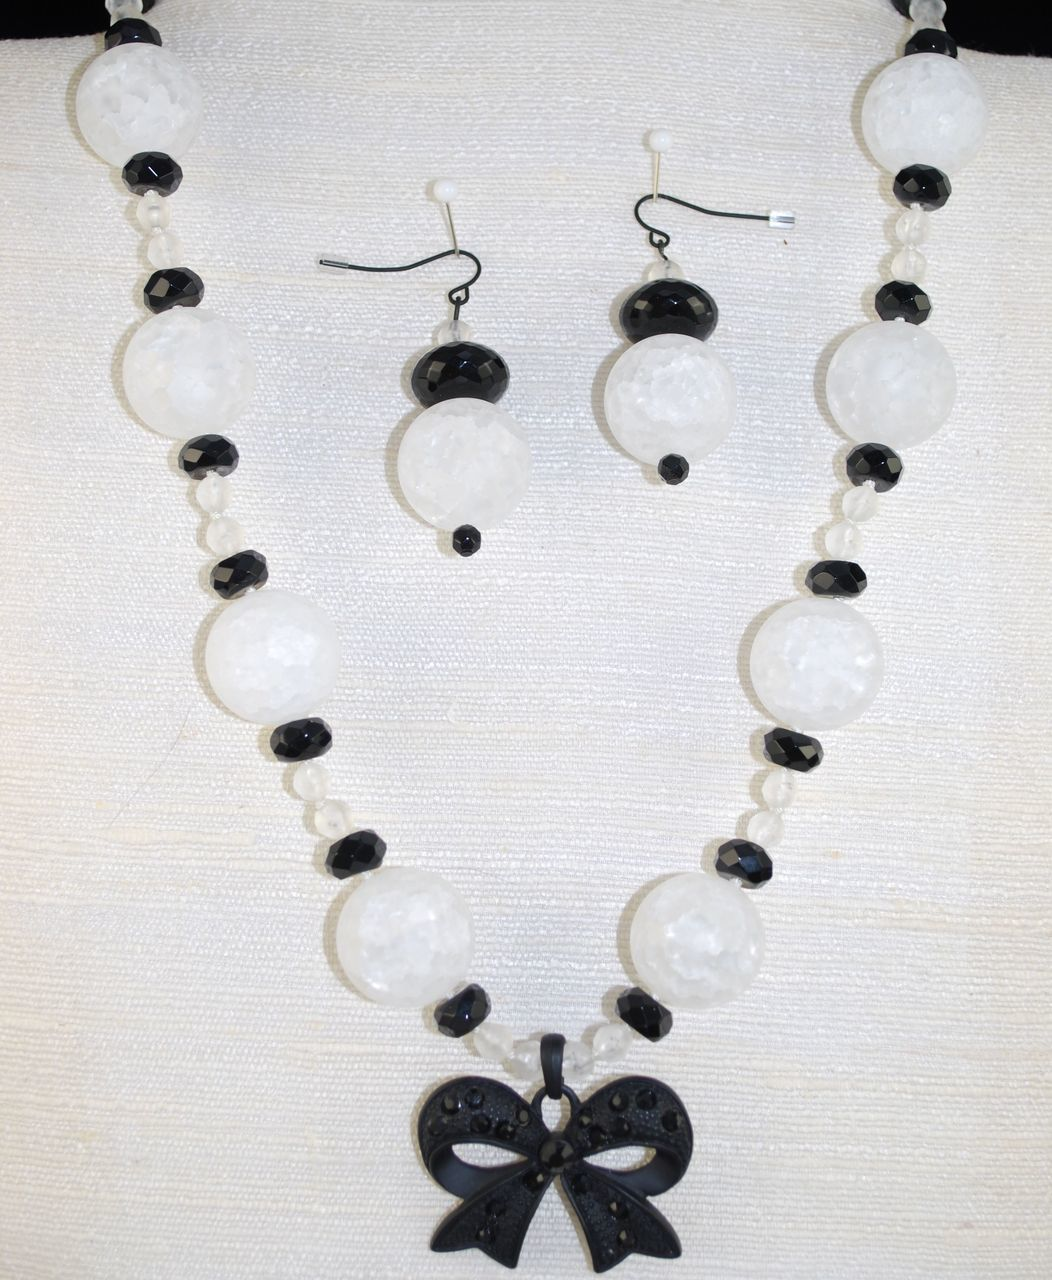 Enchanting Jewelry Creations image 15